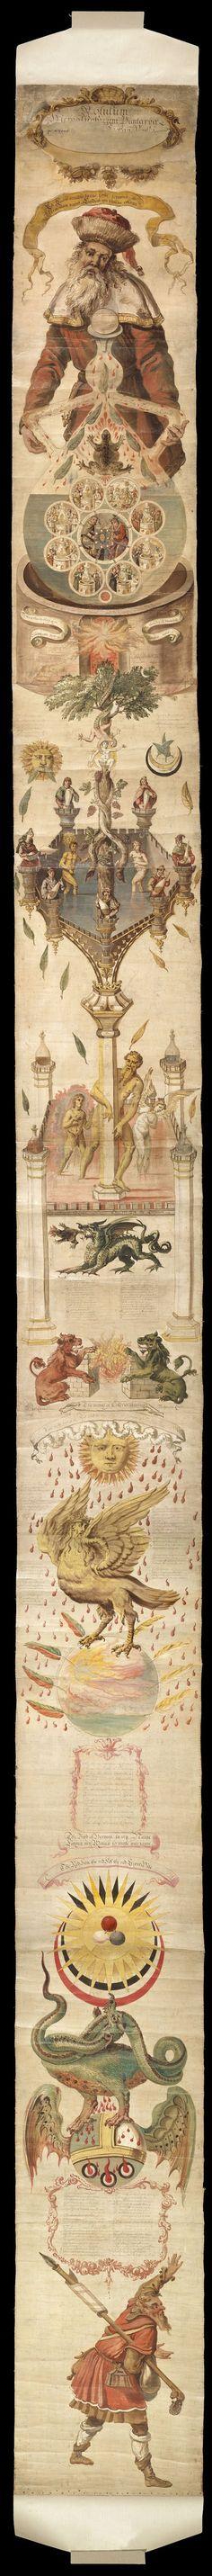 philosophia reformata mylius pdf freegolkes